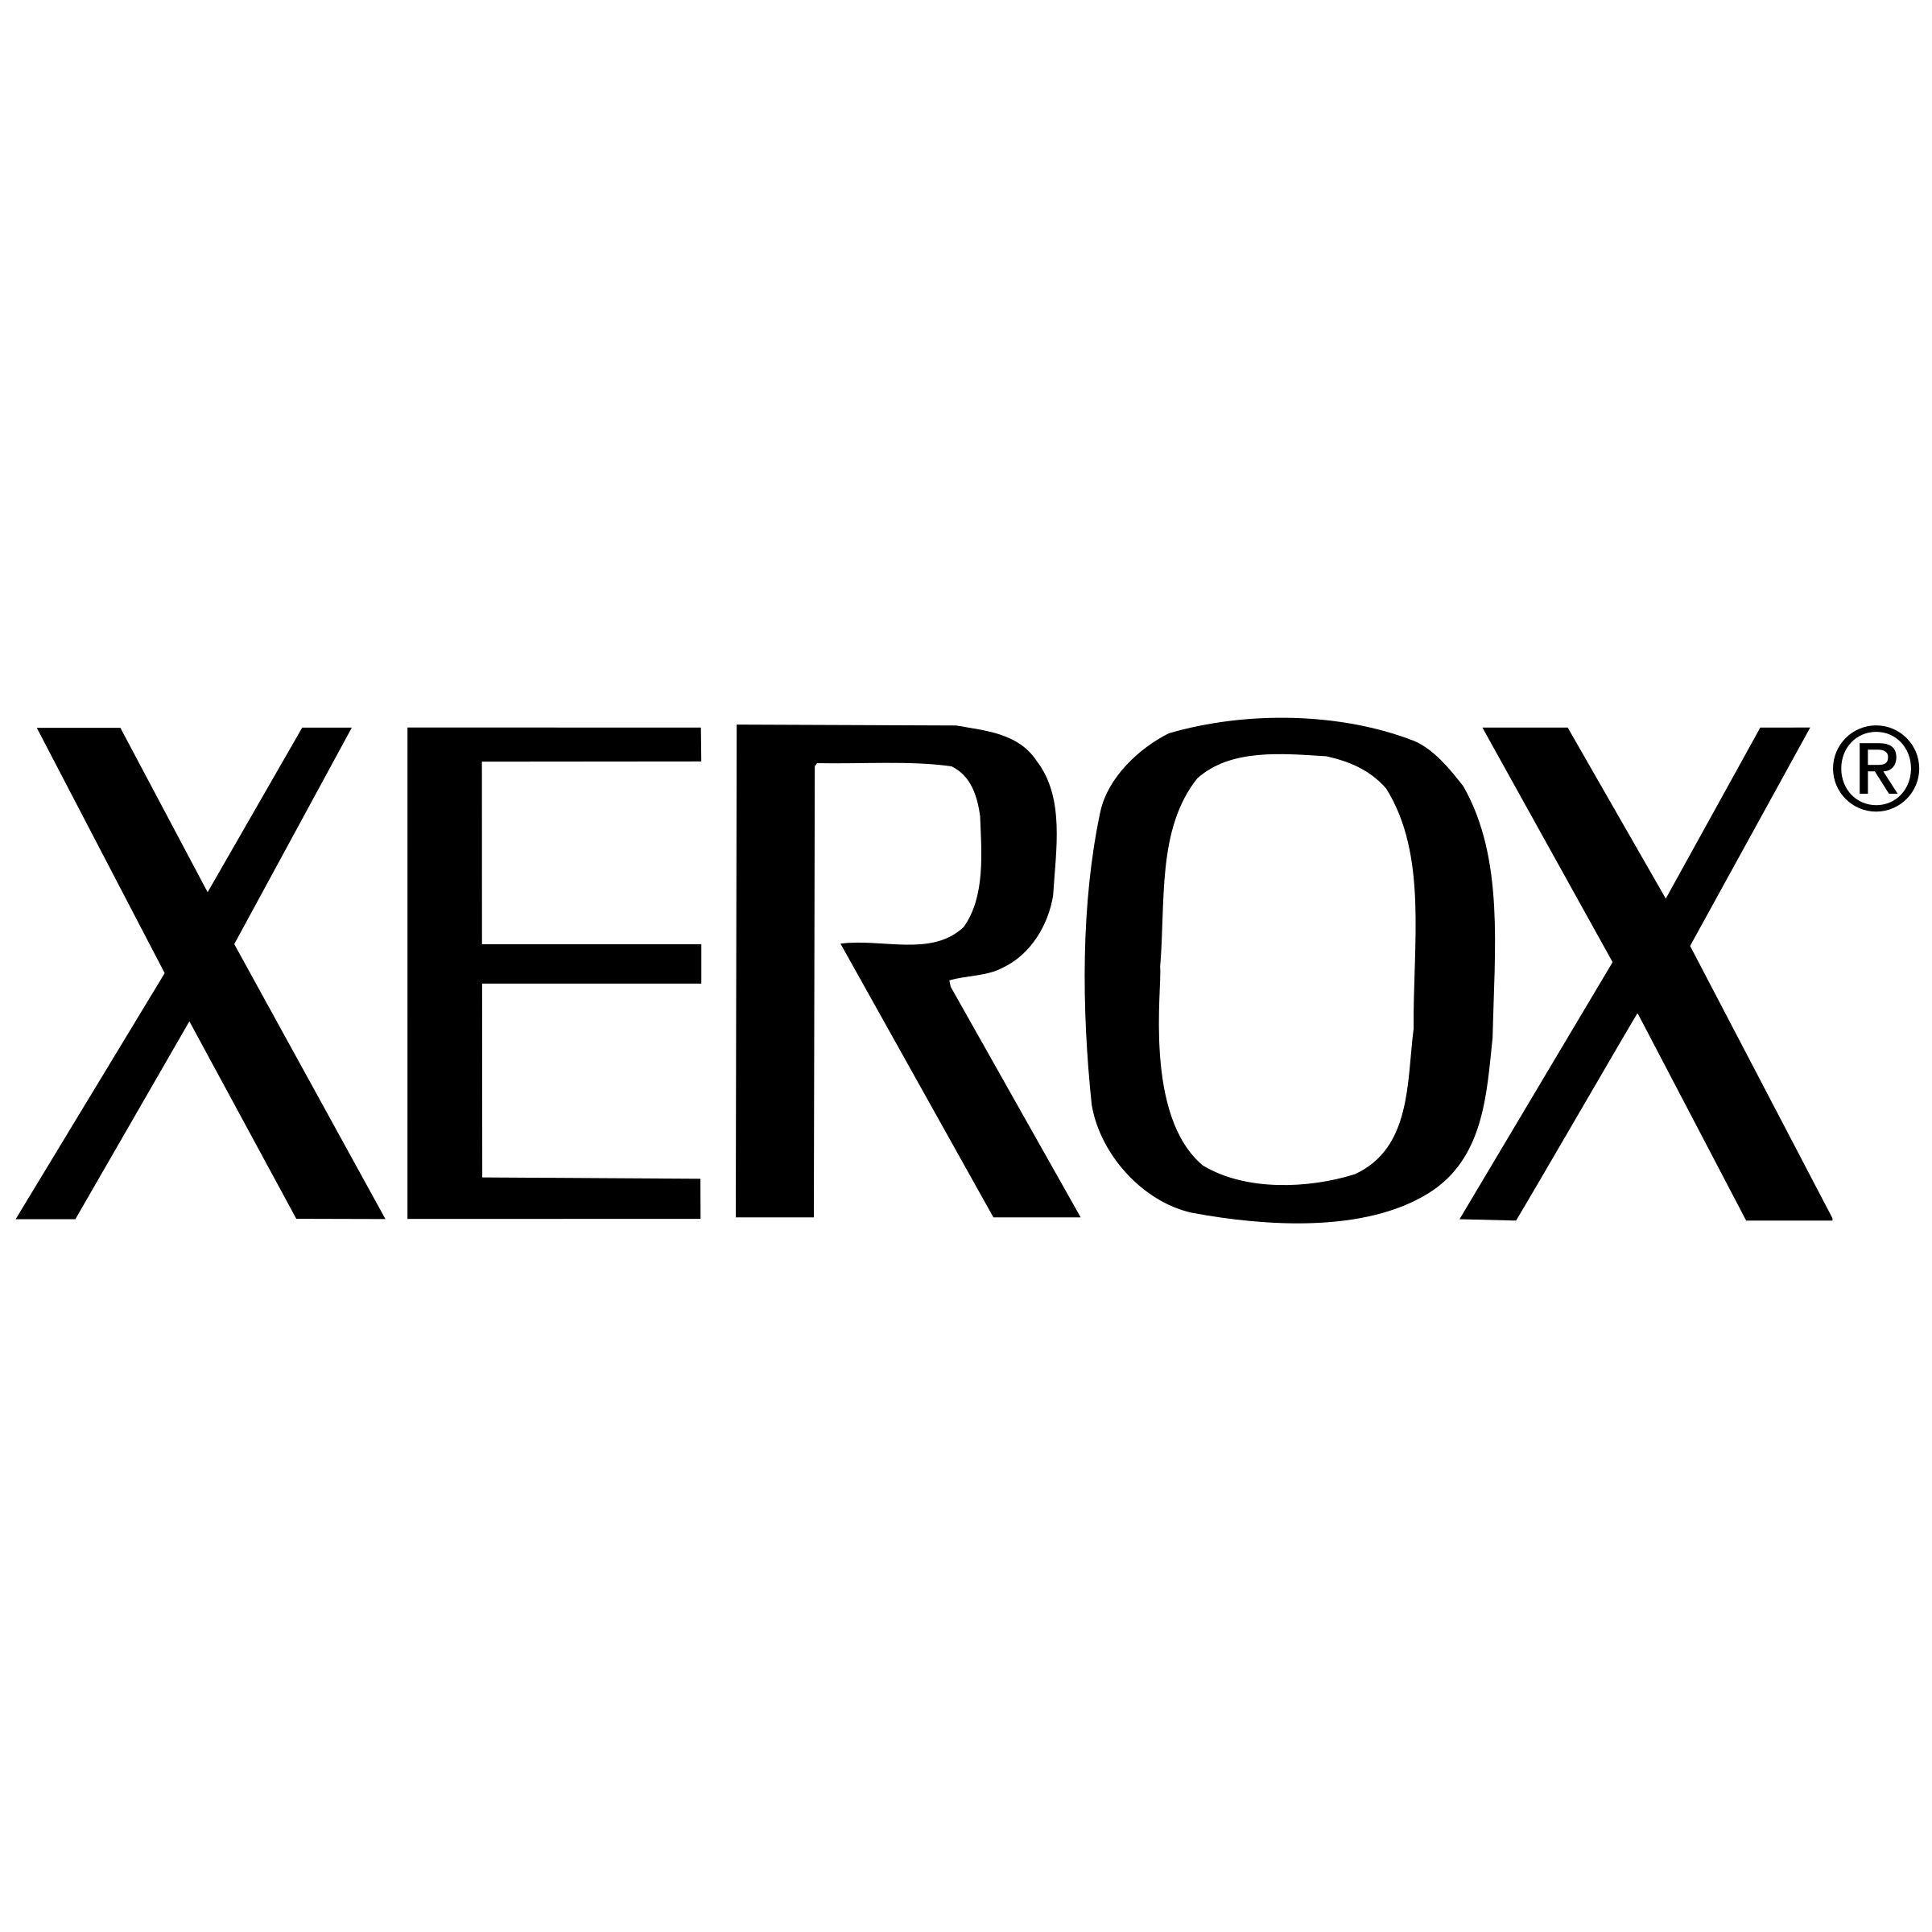 XEROX - logo